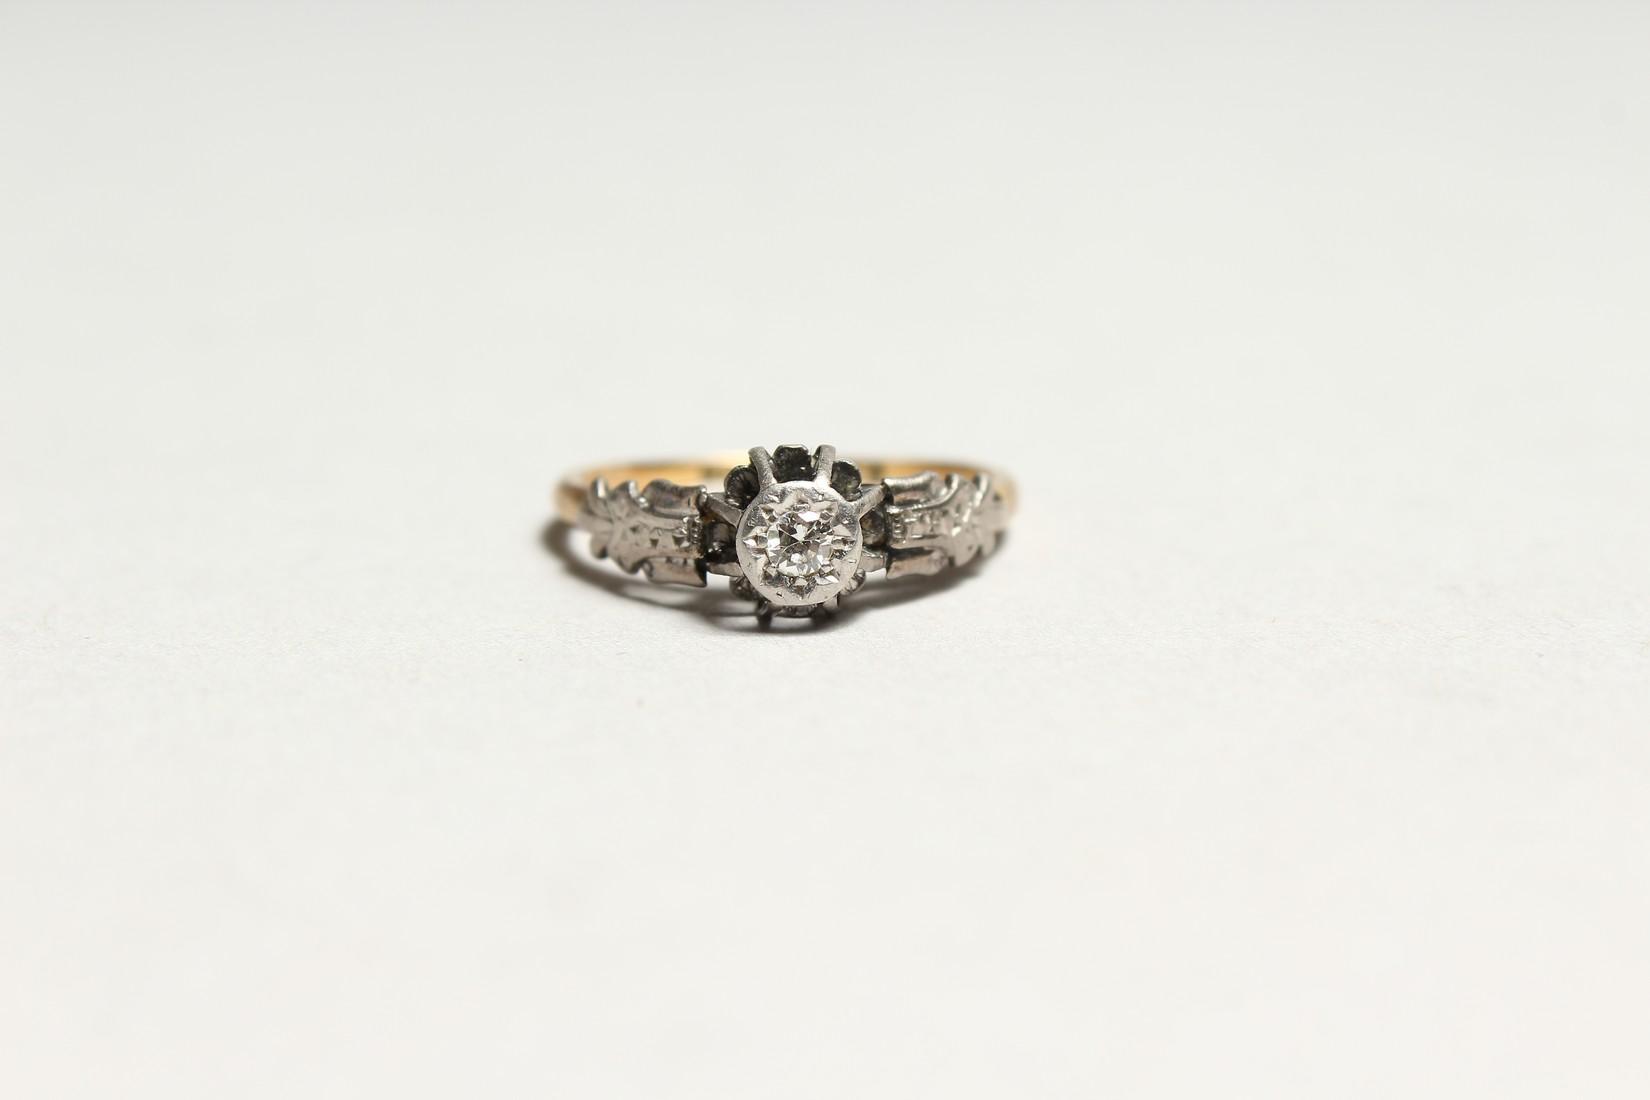 A GOOD 18CT GOLD DIAMOND SET RING - Image 2 of 5